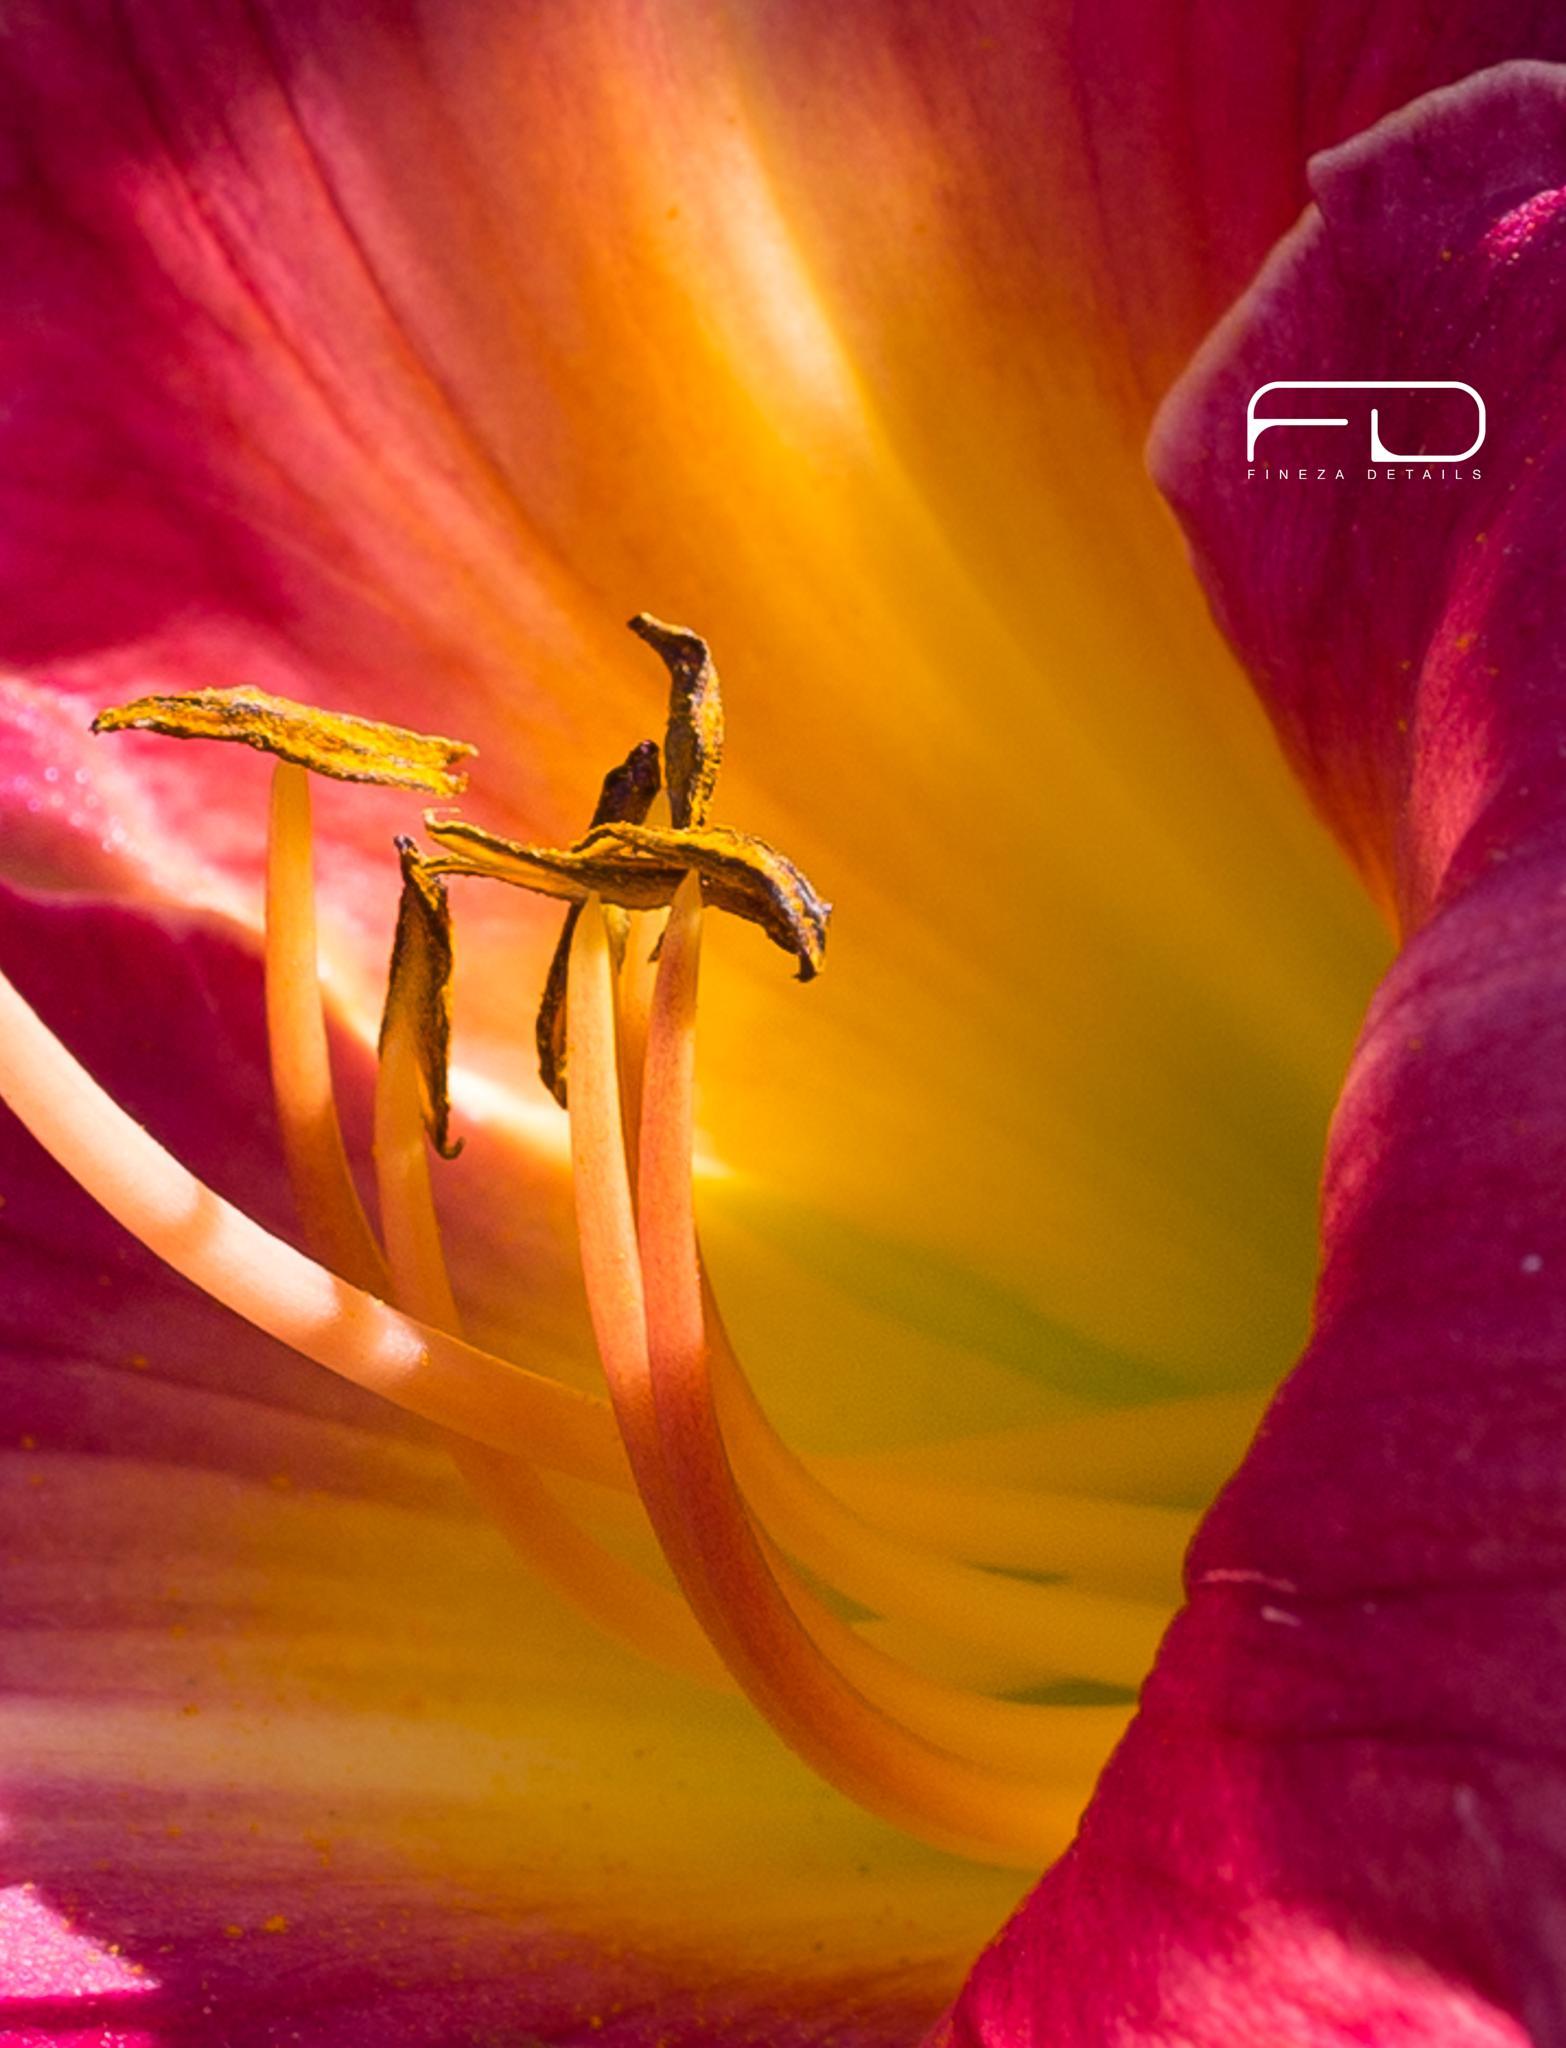 Orchid by Khalid_Fineza  Details